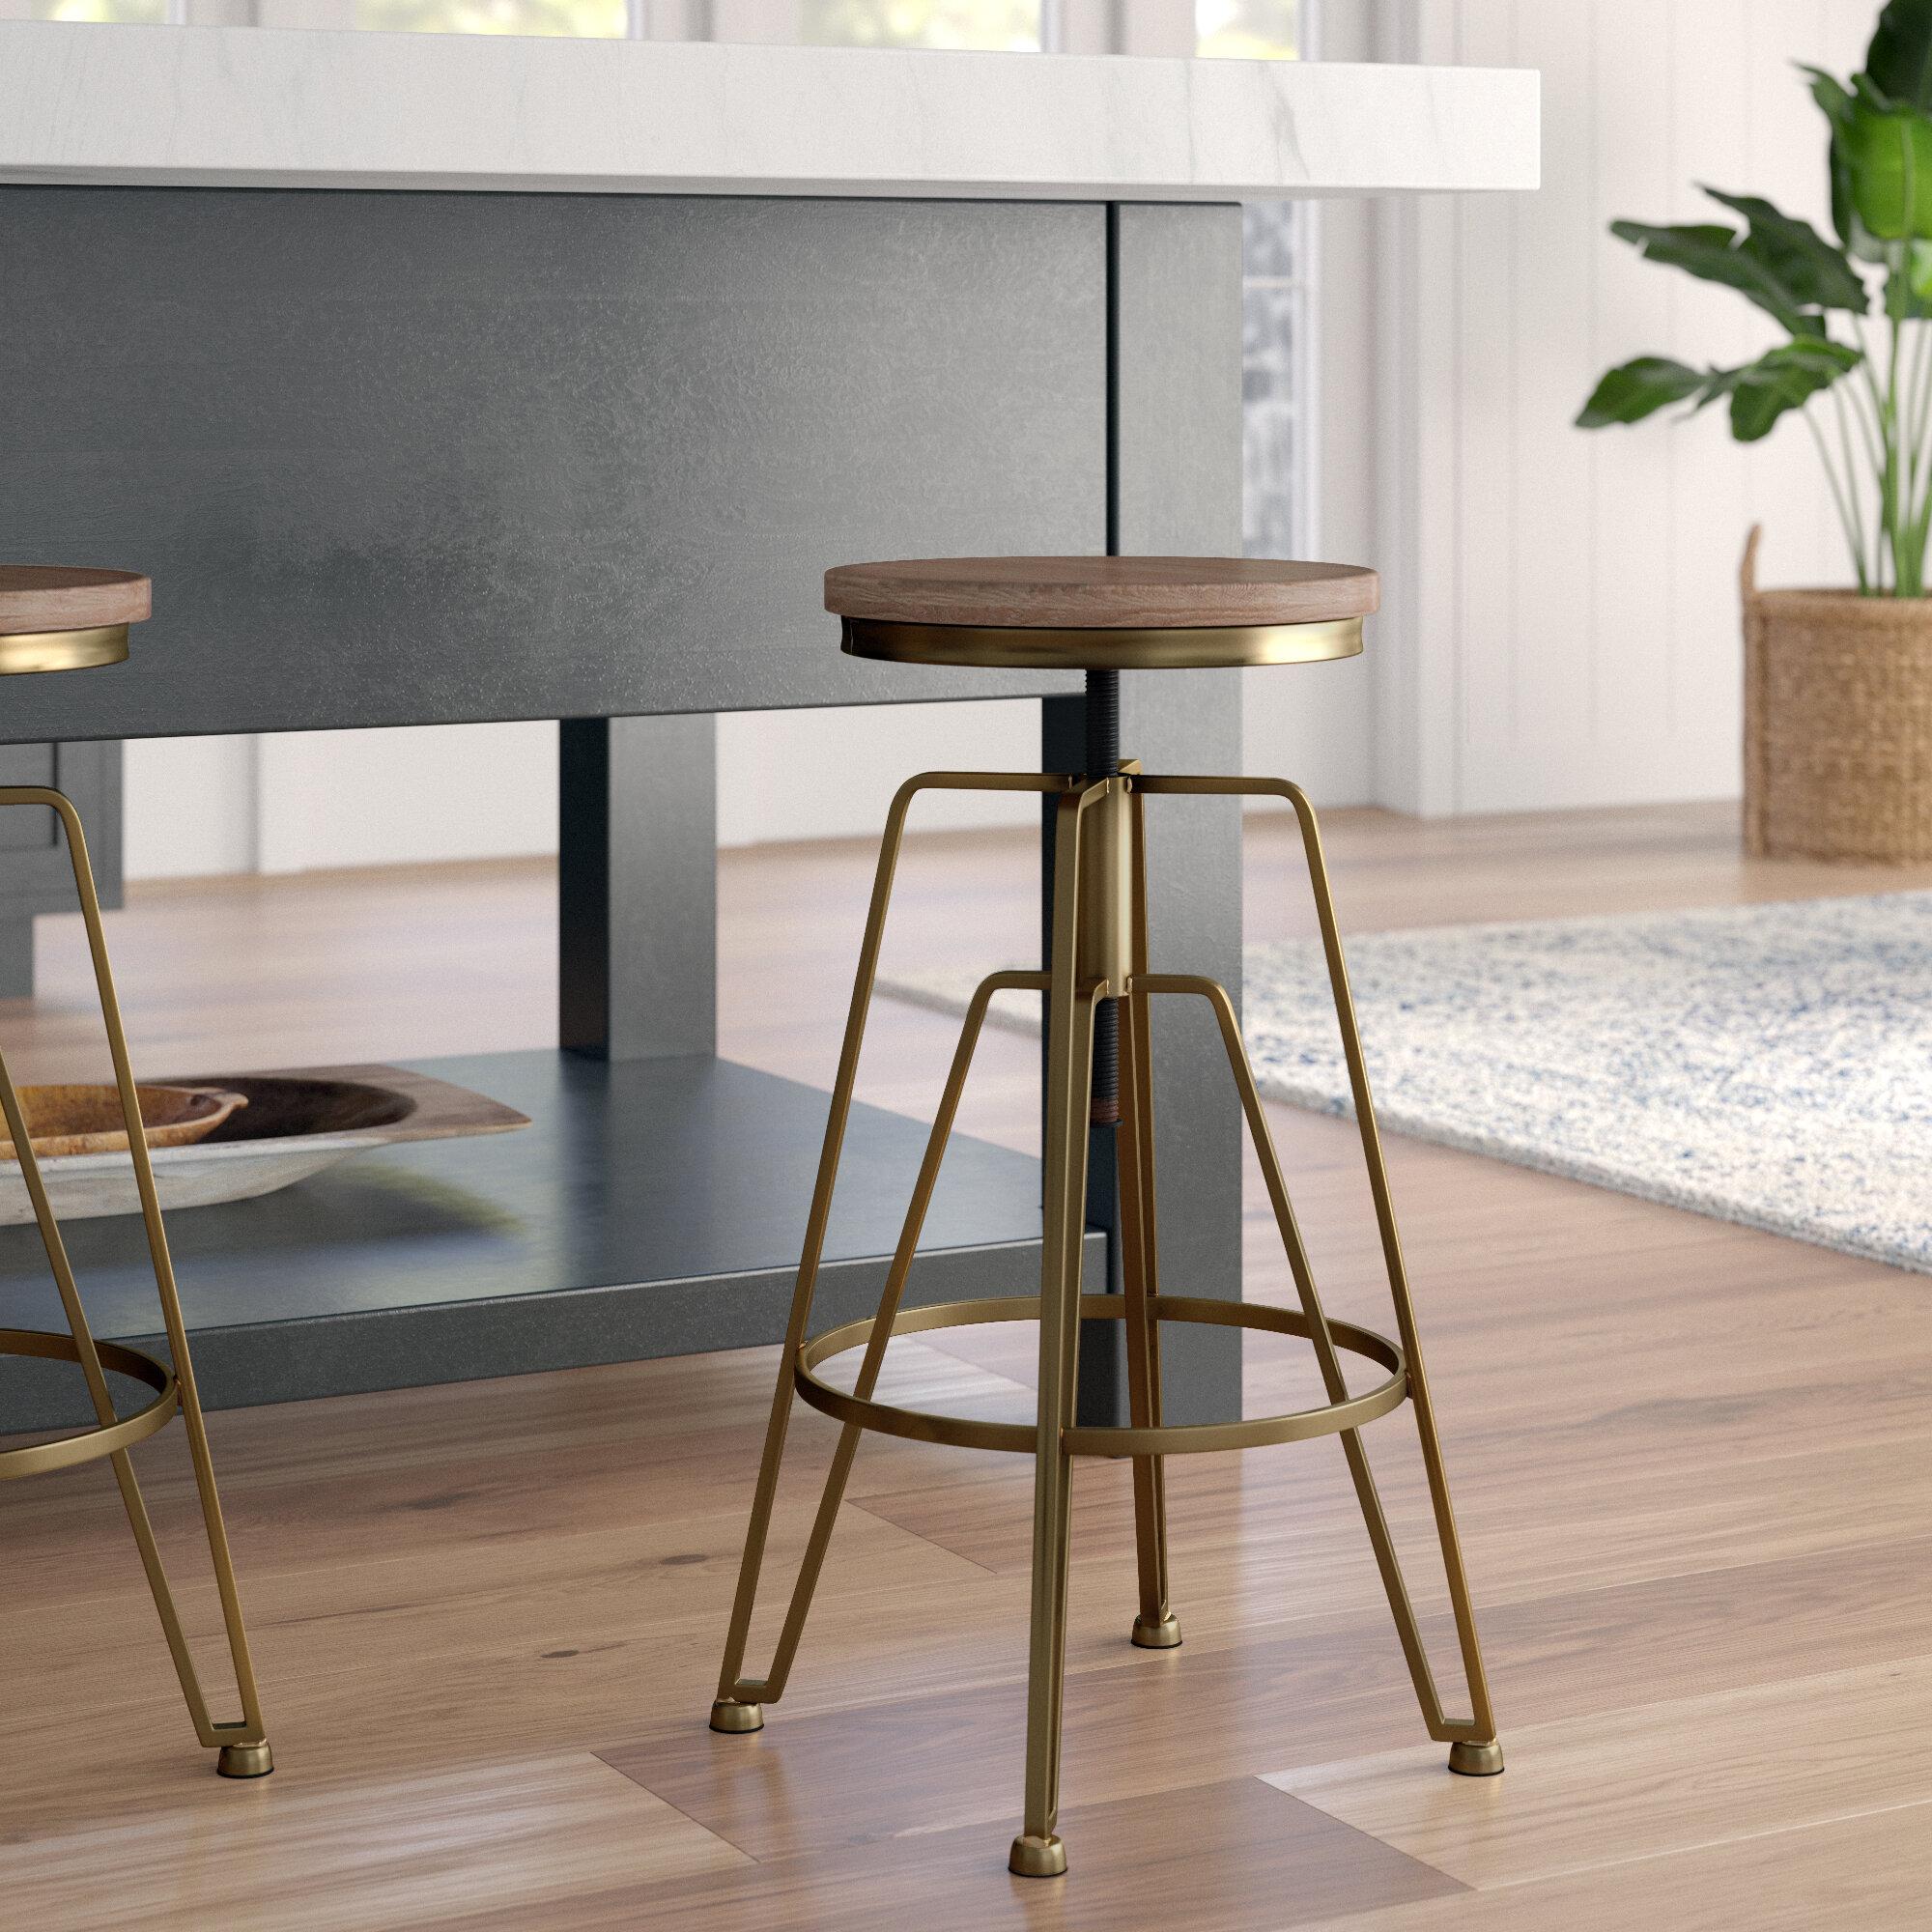 Rose Gold Kitchen Bar Stools Mesmerizing Mistana Maureen Adjustable Height Swivel Bar Stool Reviews 5591 4